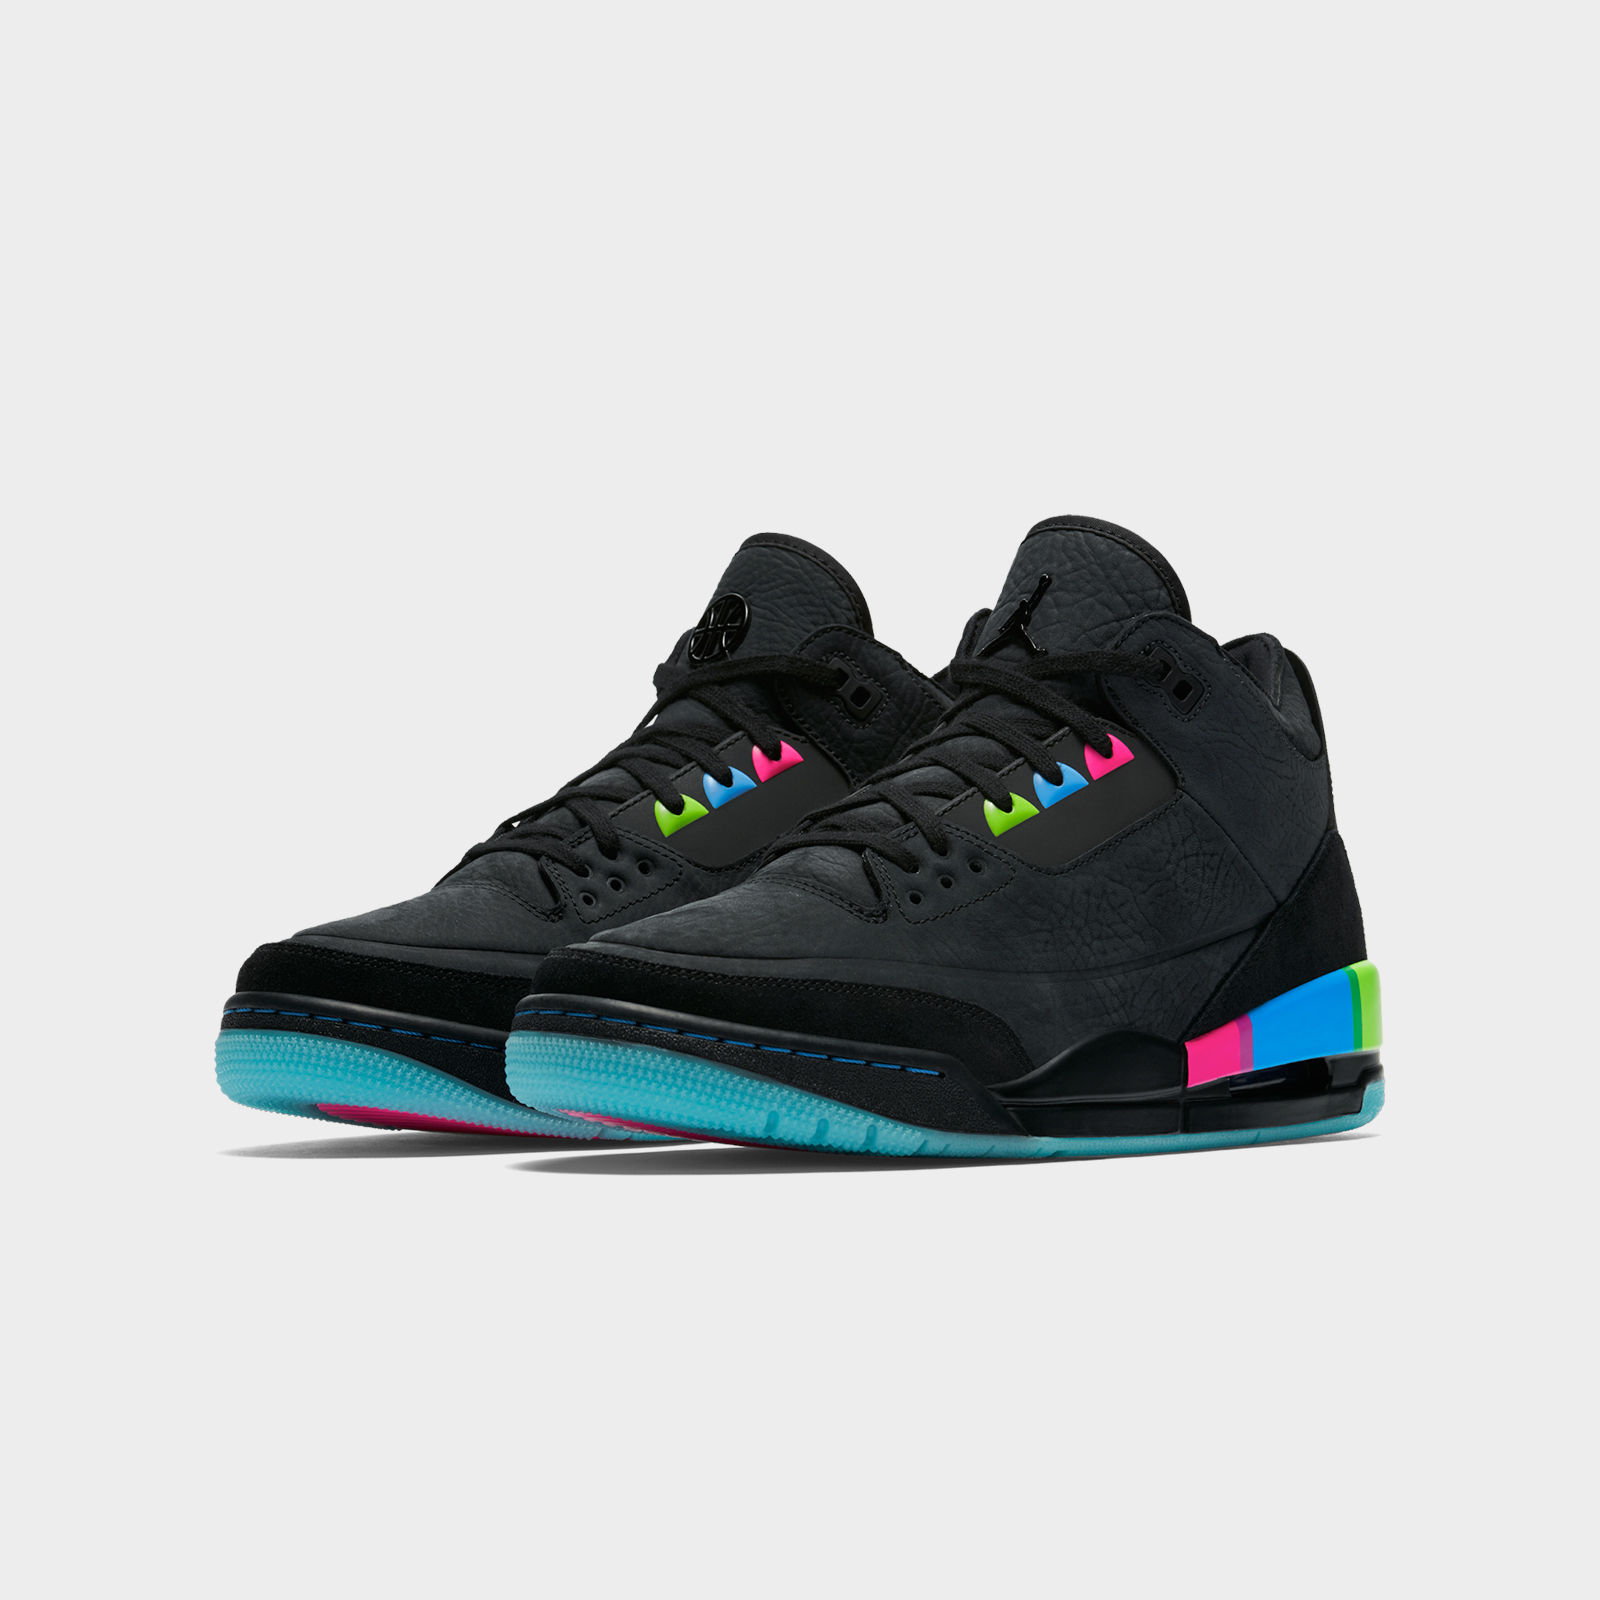 quality design c528e a1b6c Jordan Brand Air Jordan 3 Retro Se Q54 - At9195-001 - Sneakersnstuff    sneakers   streetwear online since 1999